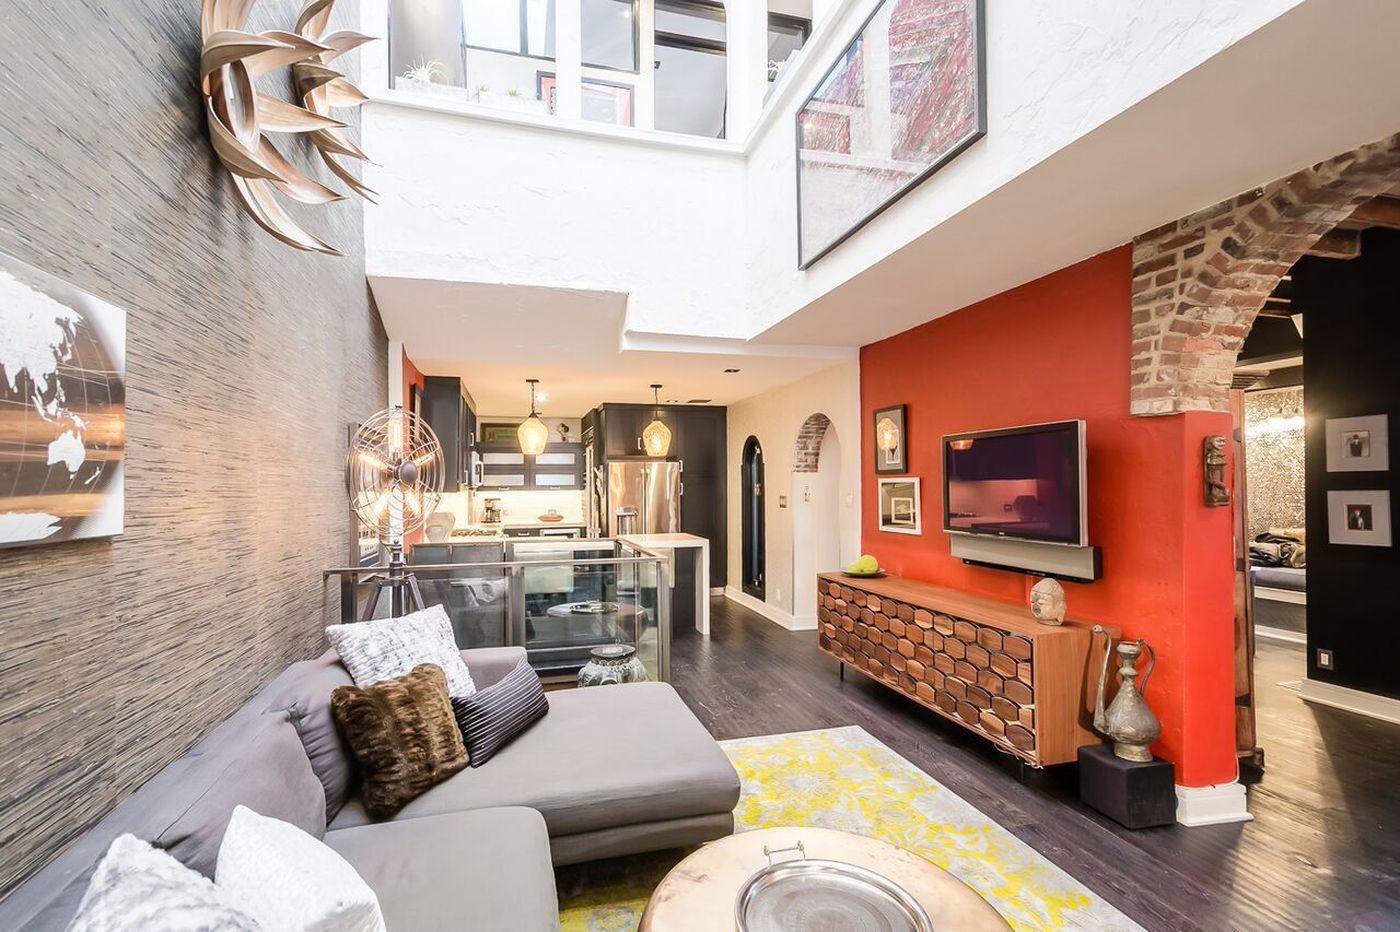 Ask Jennifer Adams: What furniture can make an awkward living room great?